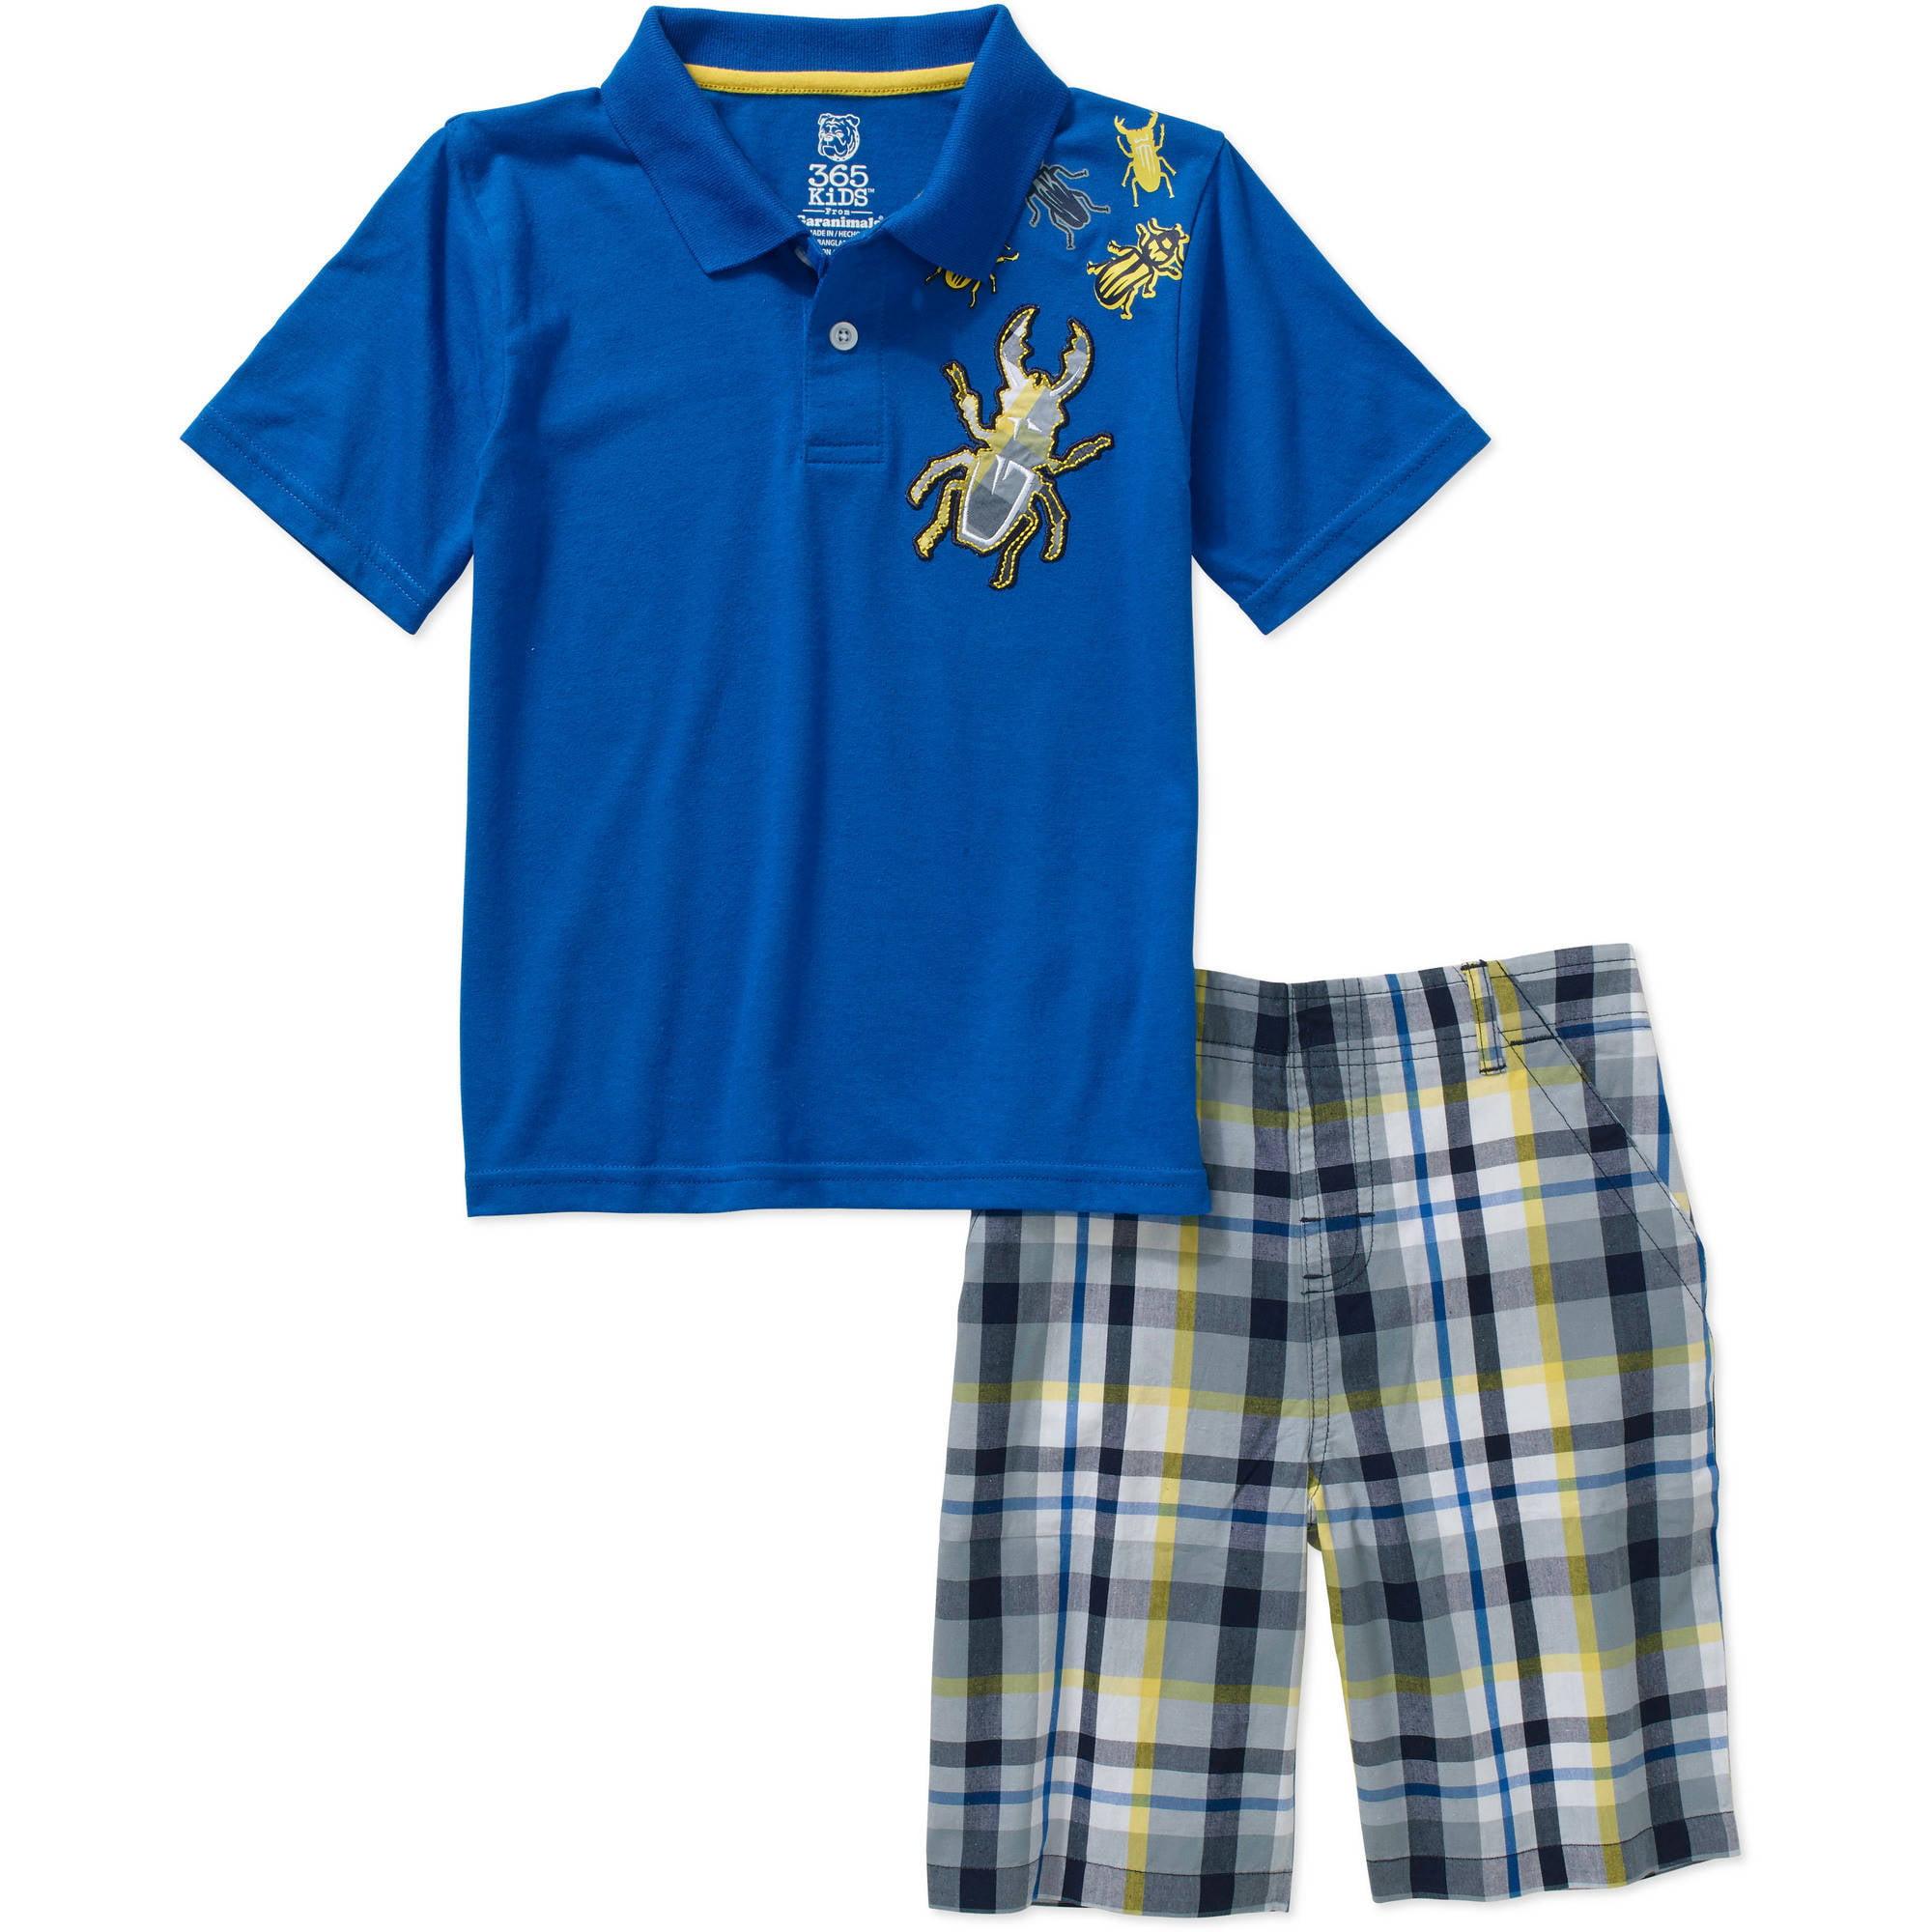 365 Kids From Garanimals Boys' 2 Piece Polo Shirt & Plaid Short Set